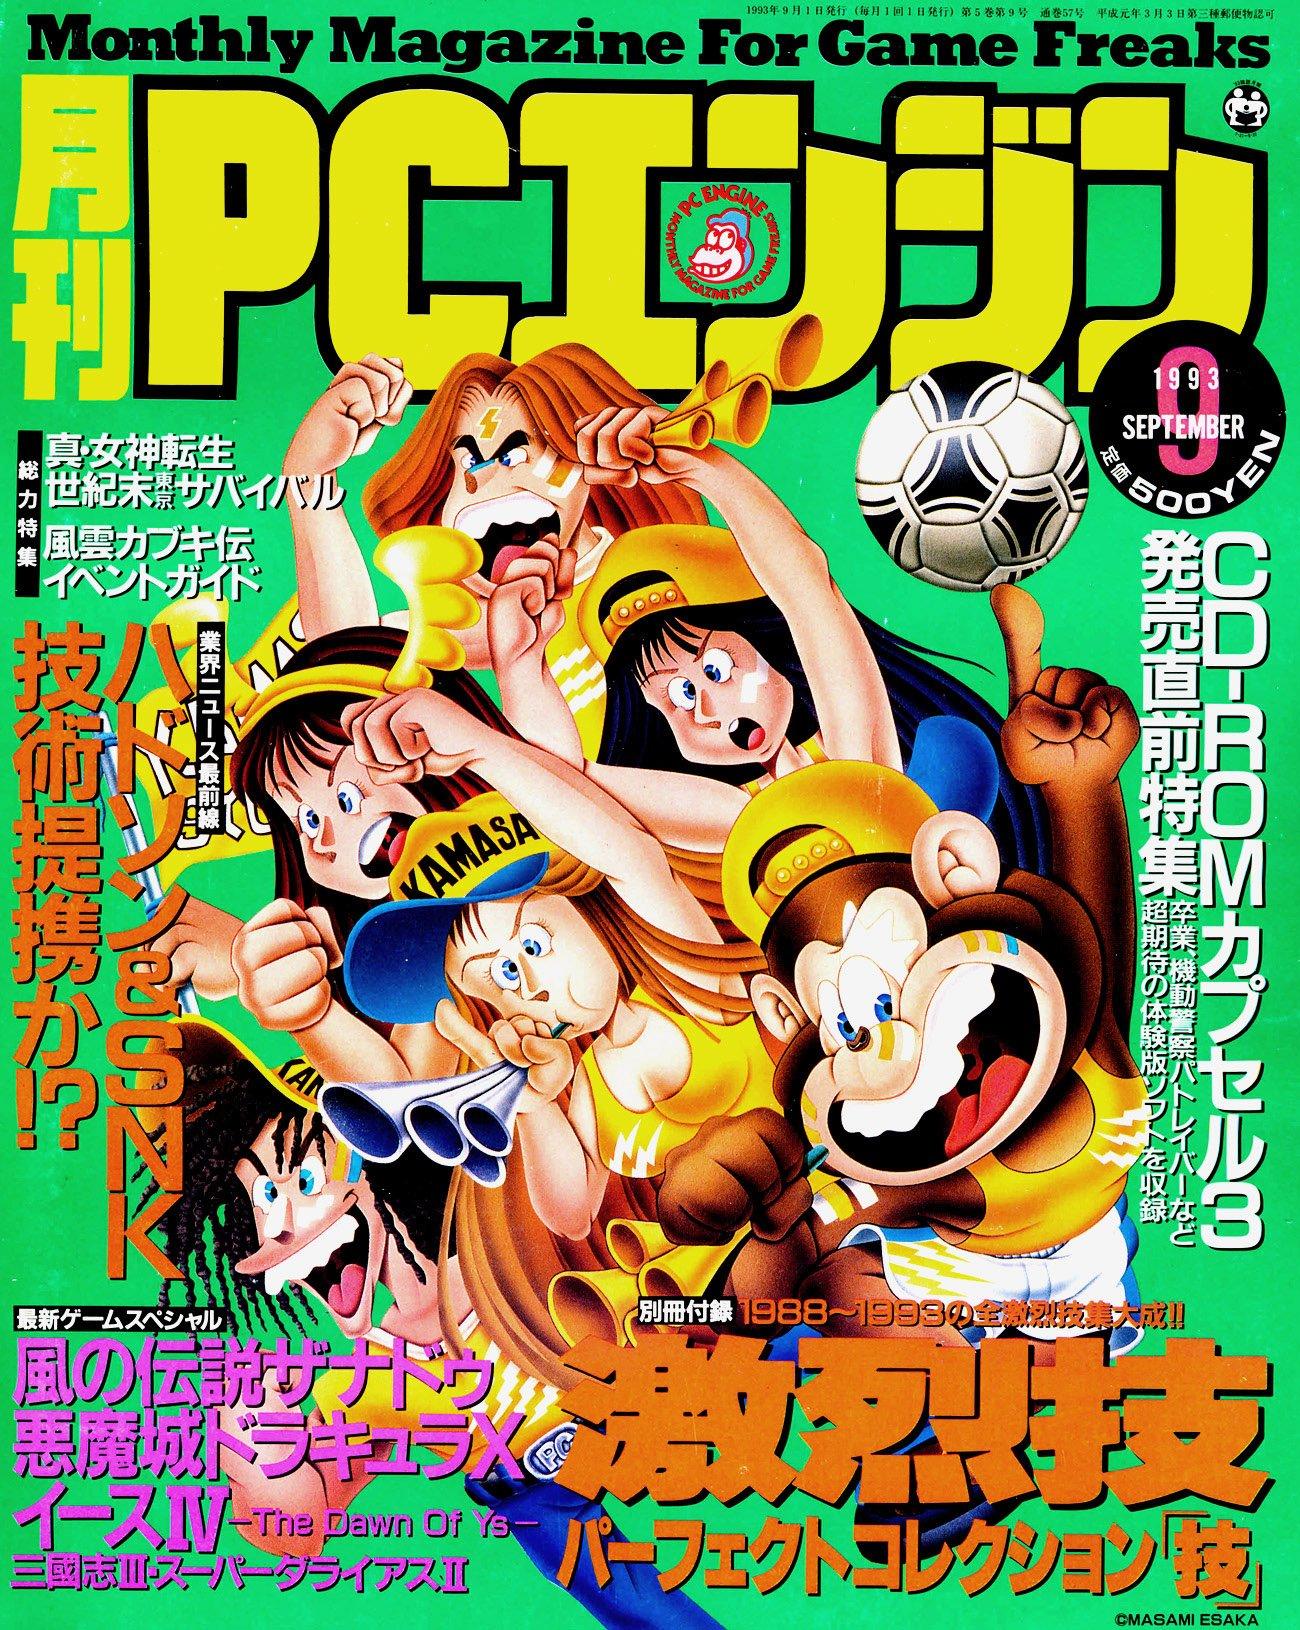 Gekkan PC Engine Issue 57 (September 1993)